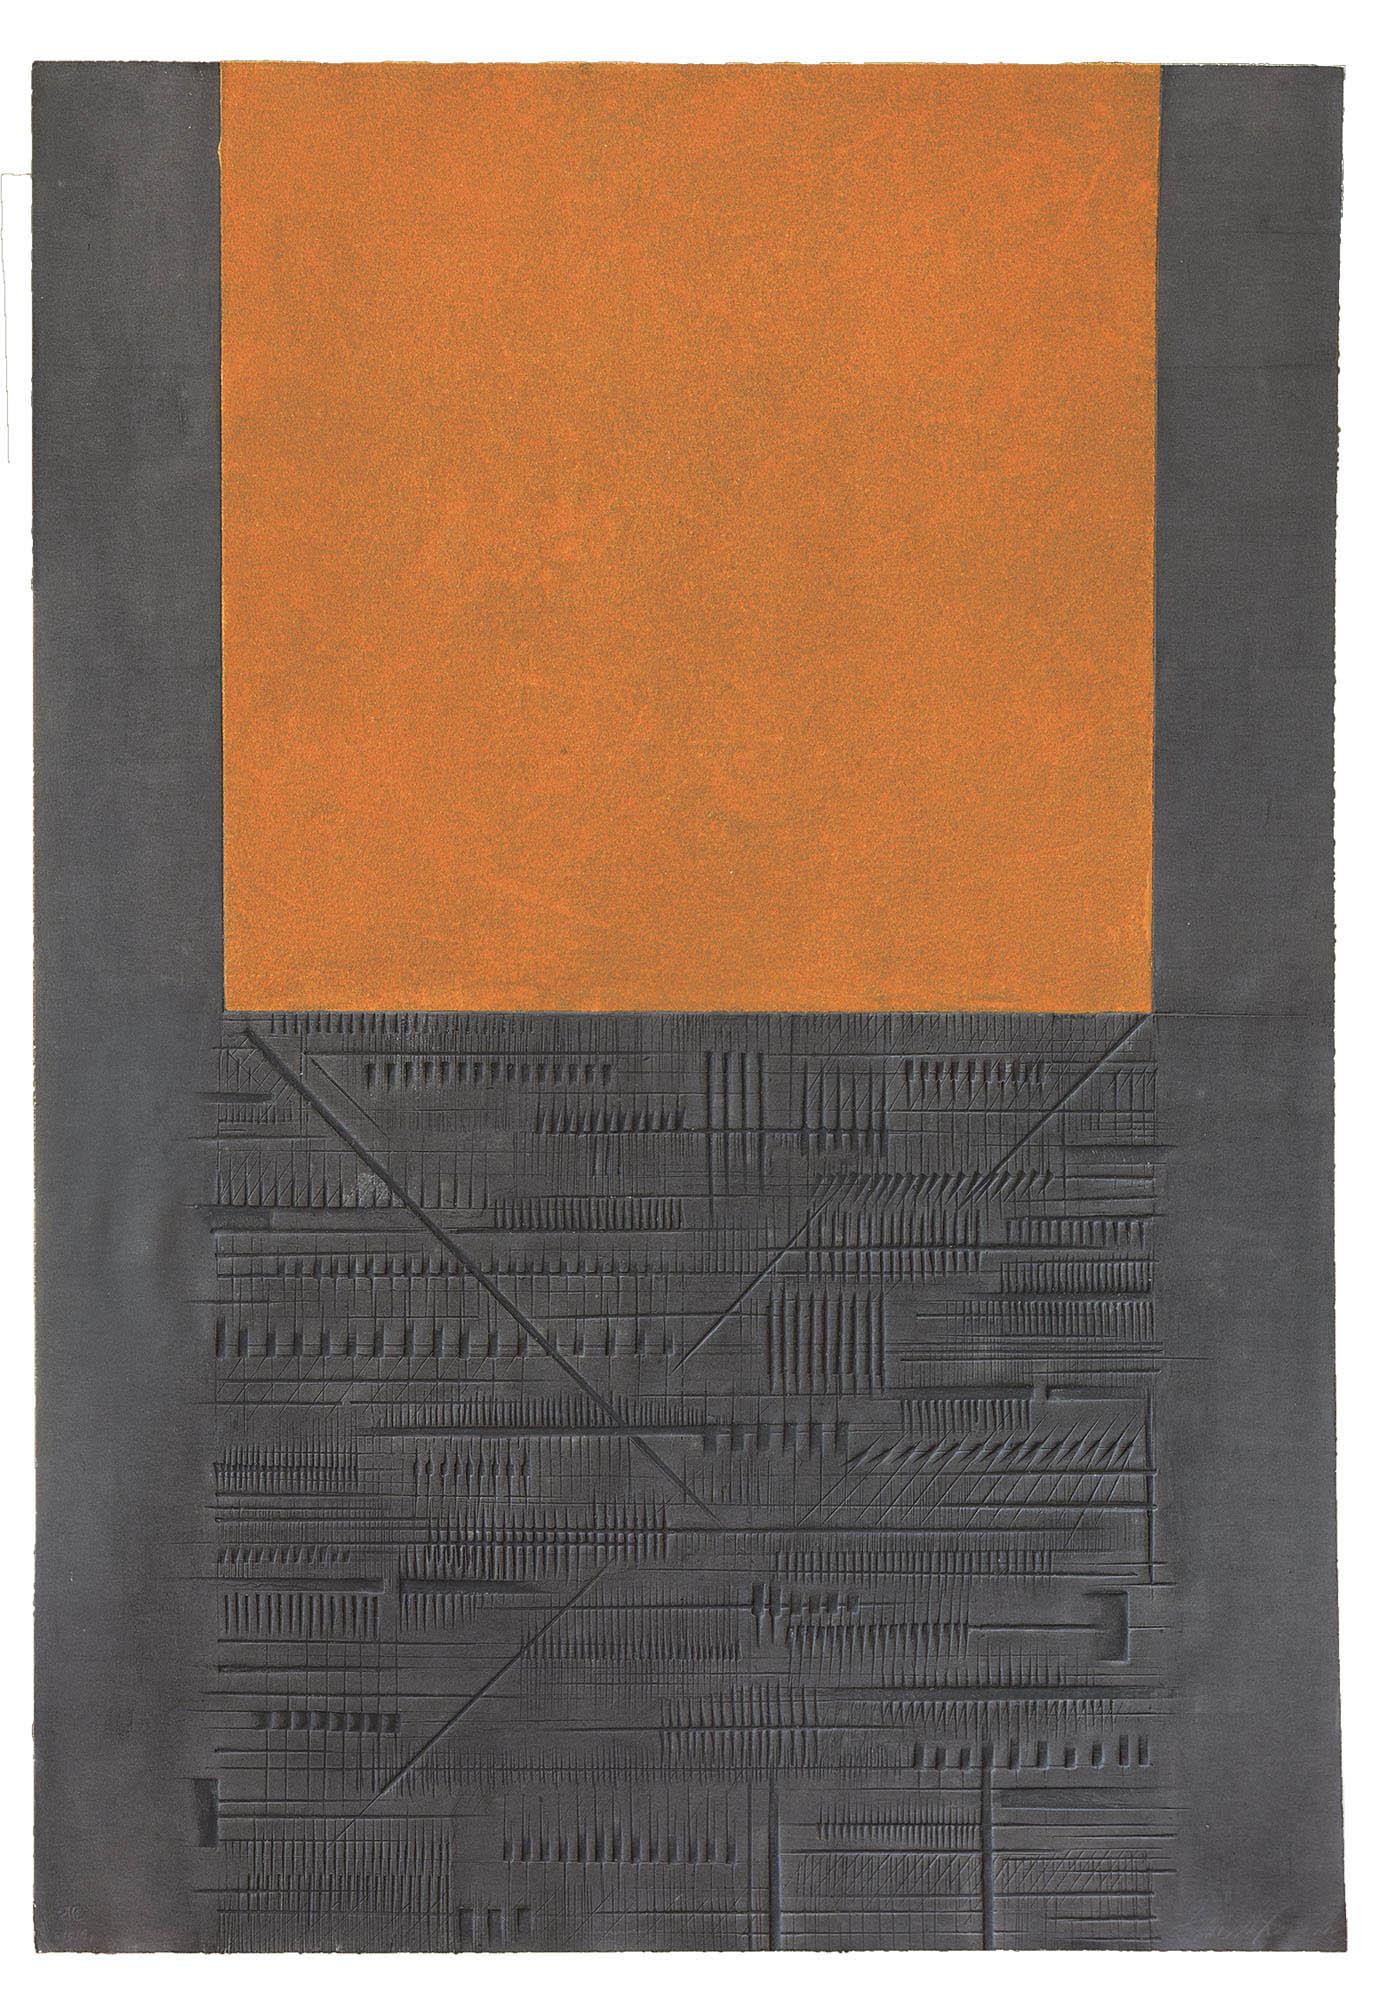 Cronaca 3 – Ugo Mulas, 1976 (2)